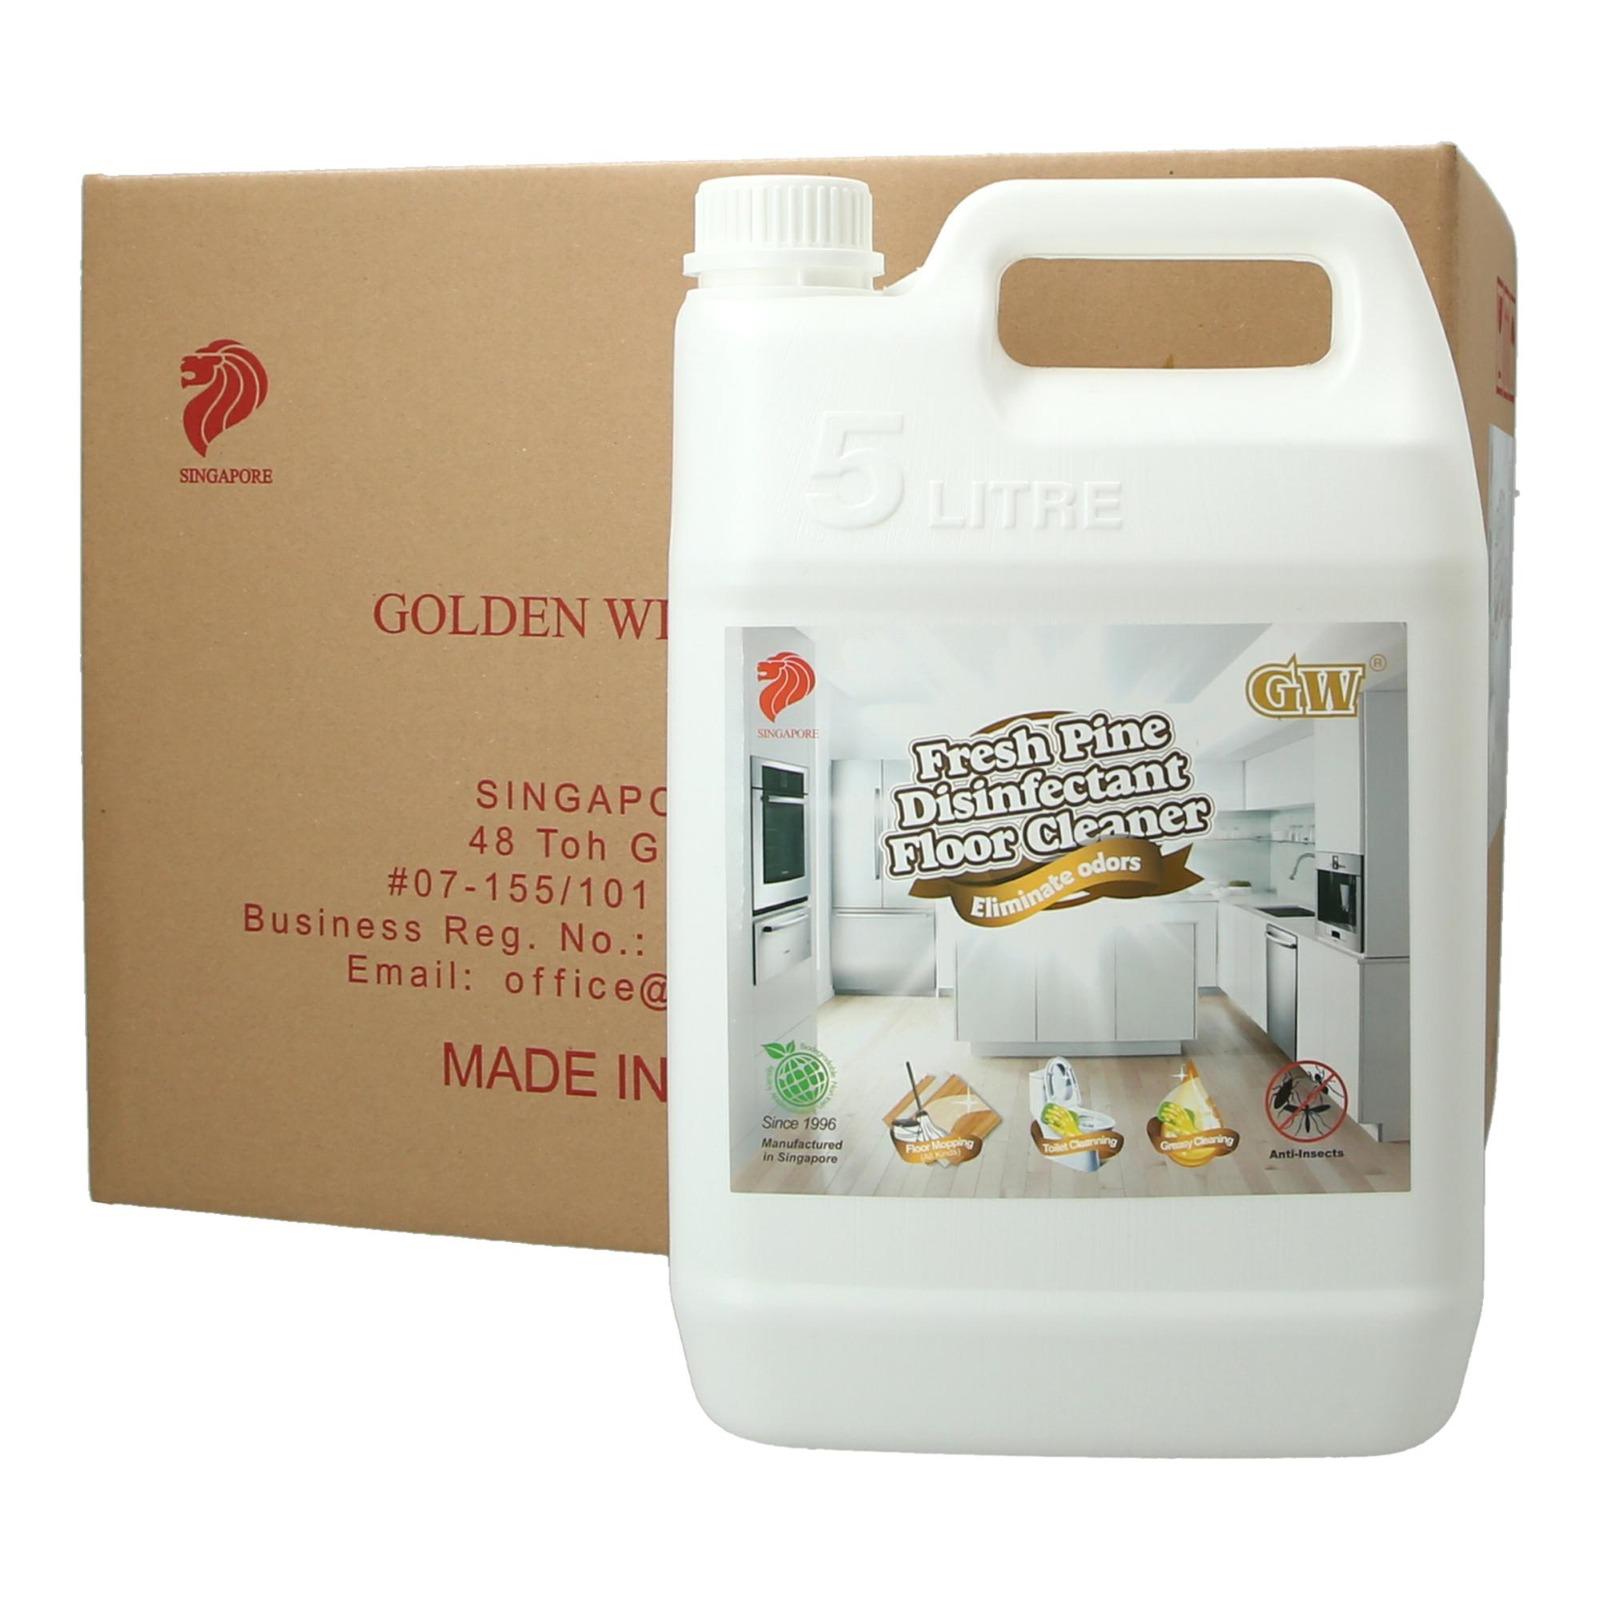 GW Disinfectant Floor Cleaner Carton - Fresh Pine